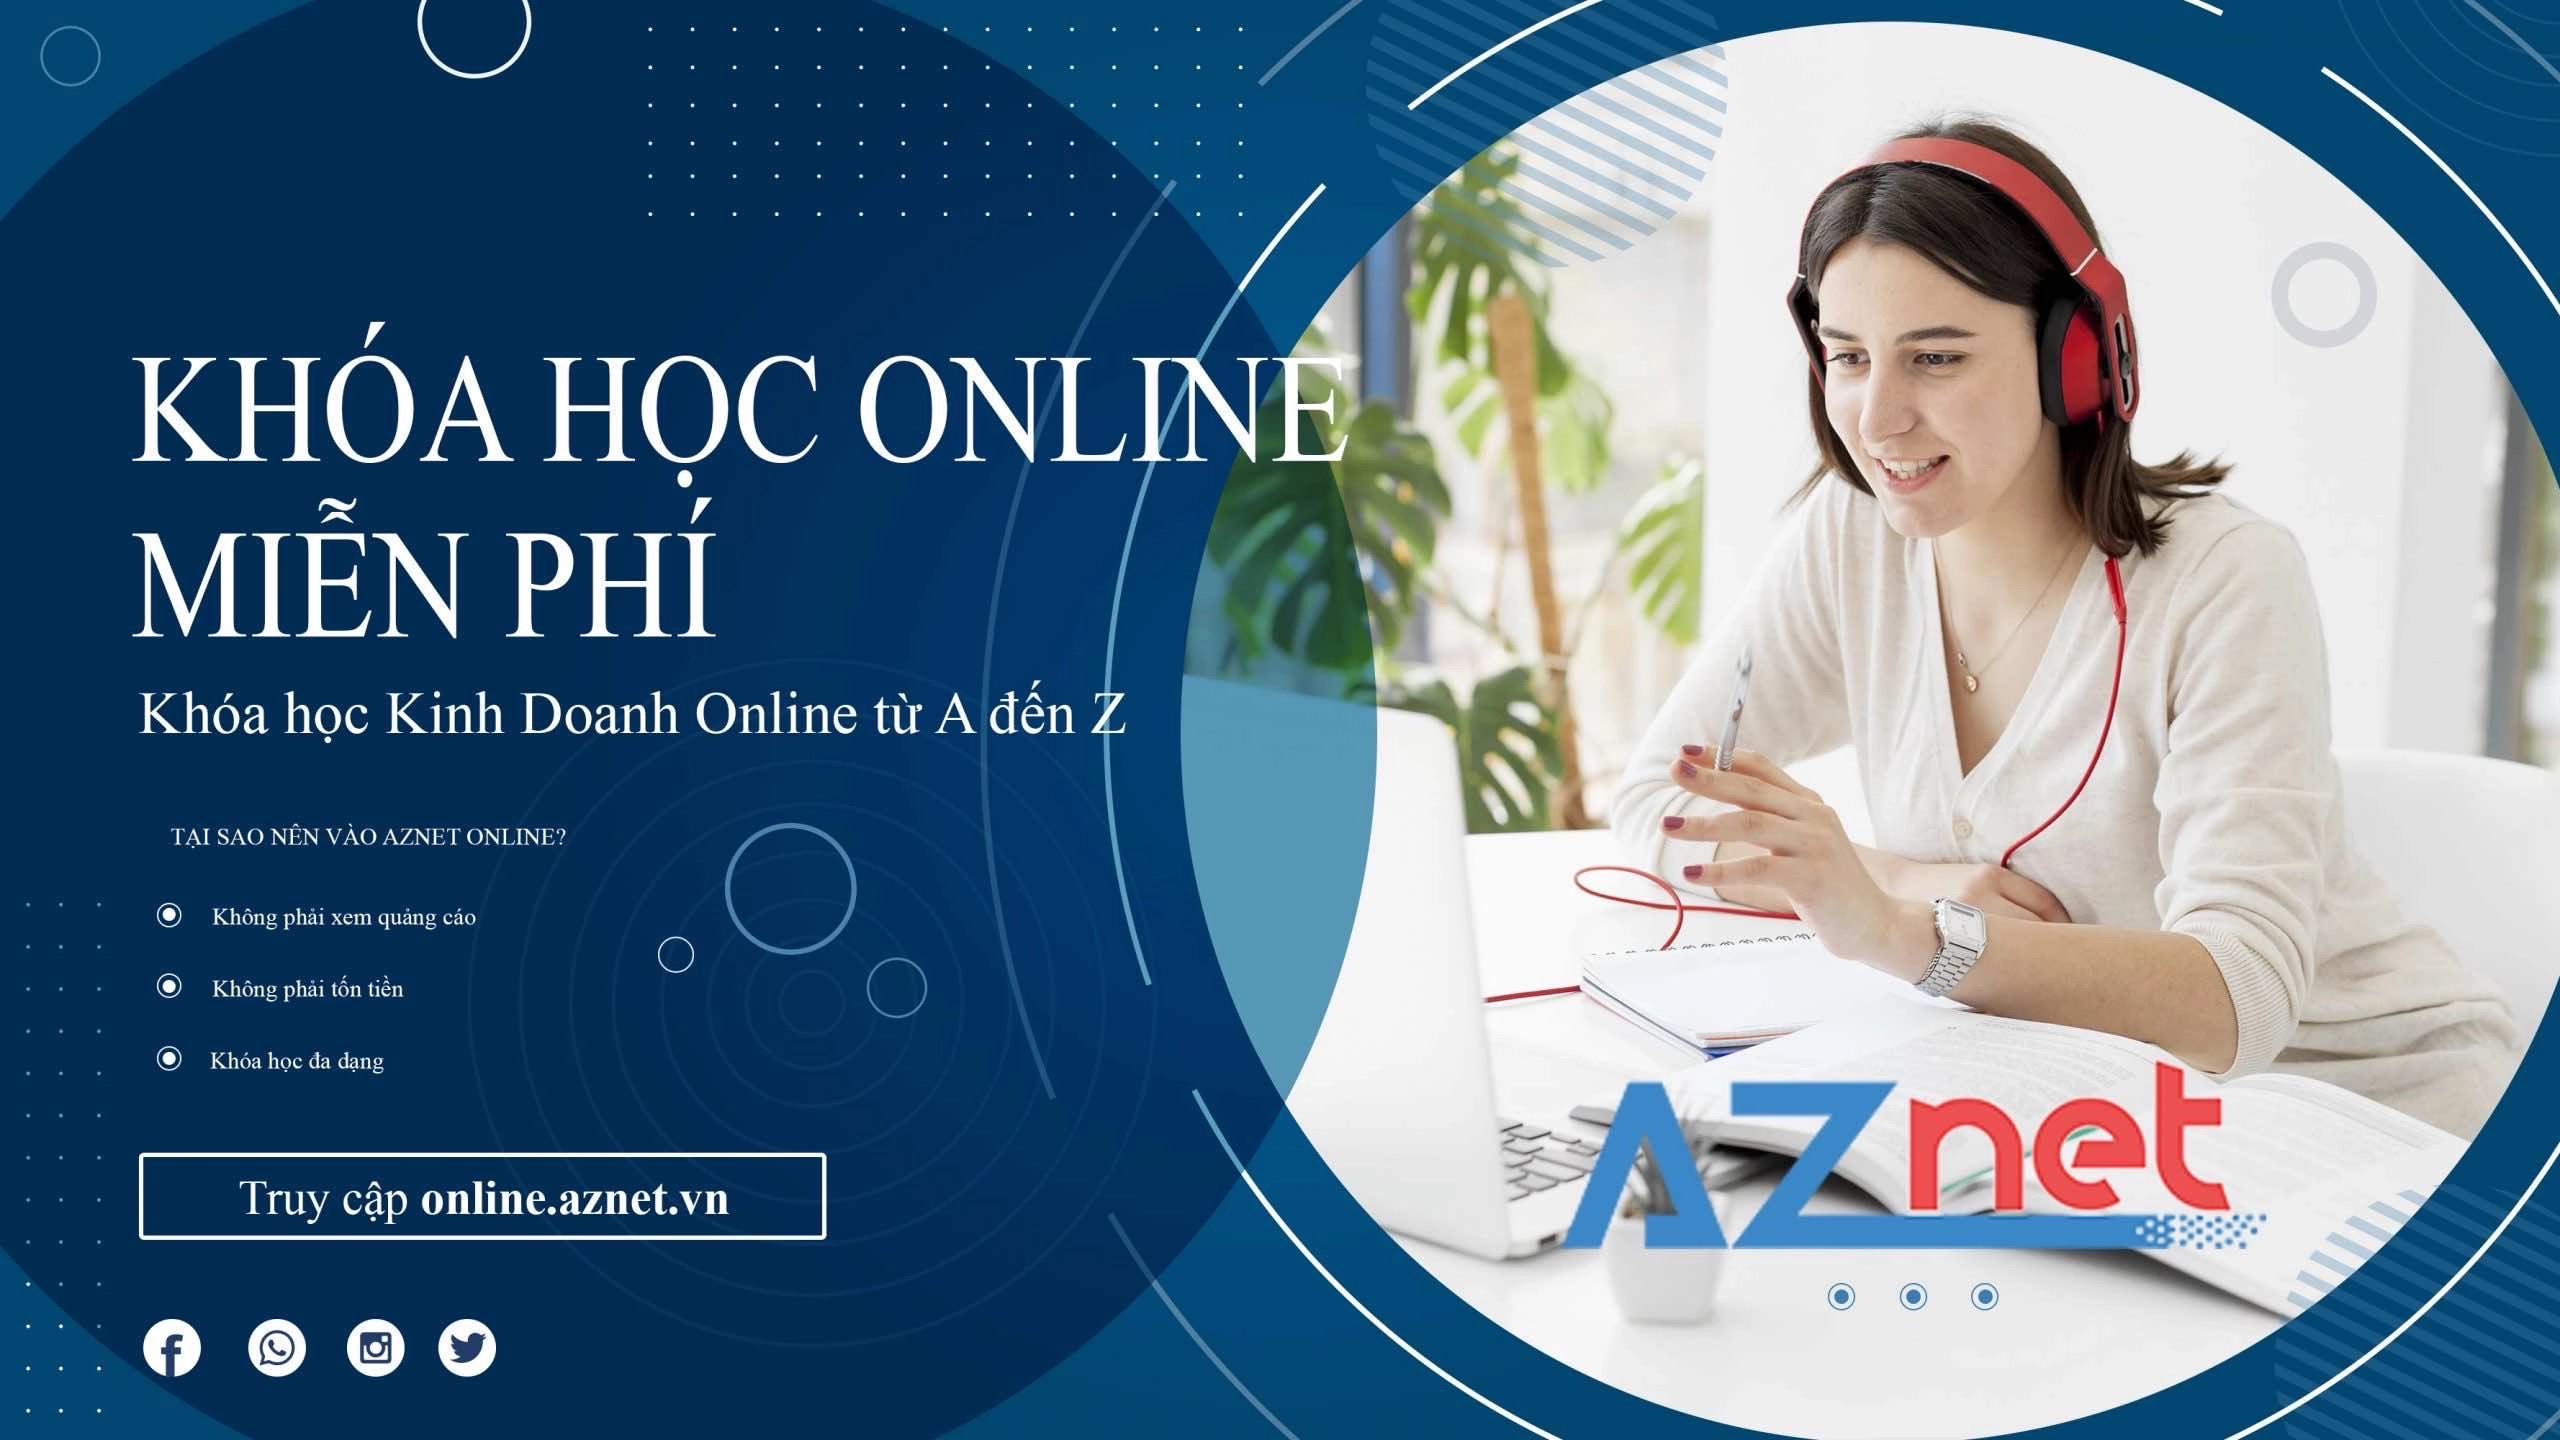 Học kinh doanh online miễn phí